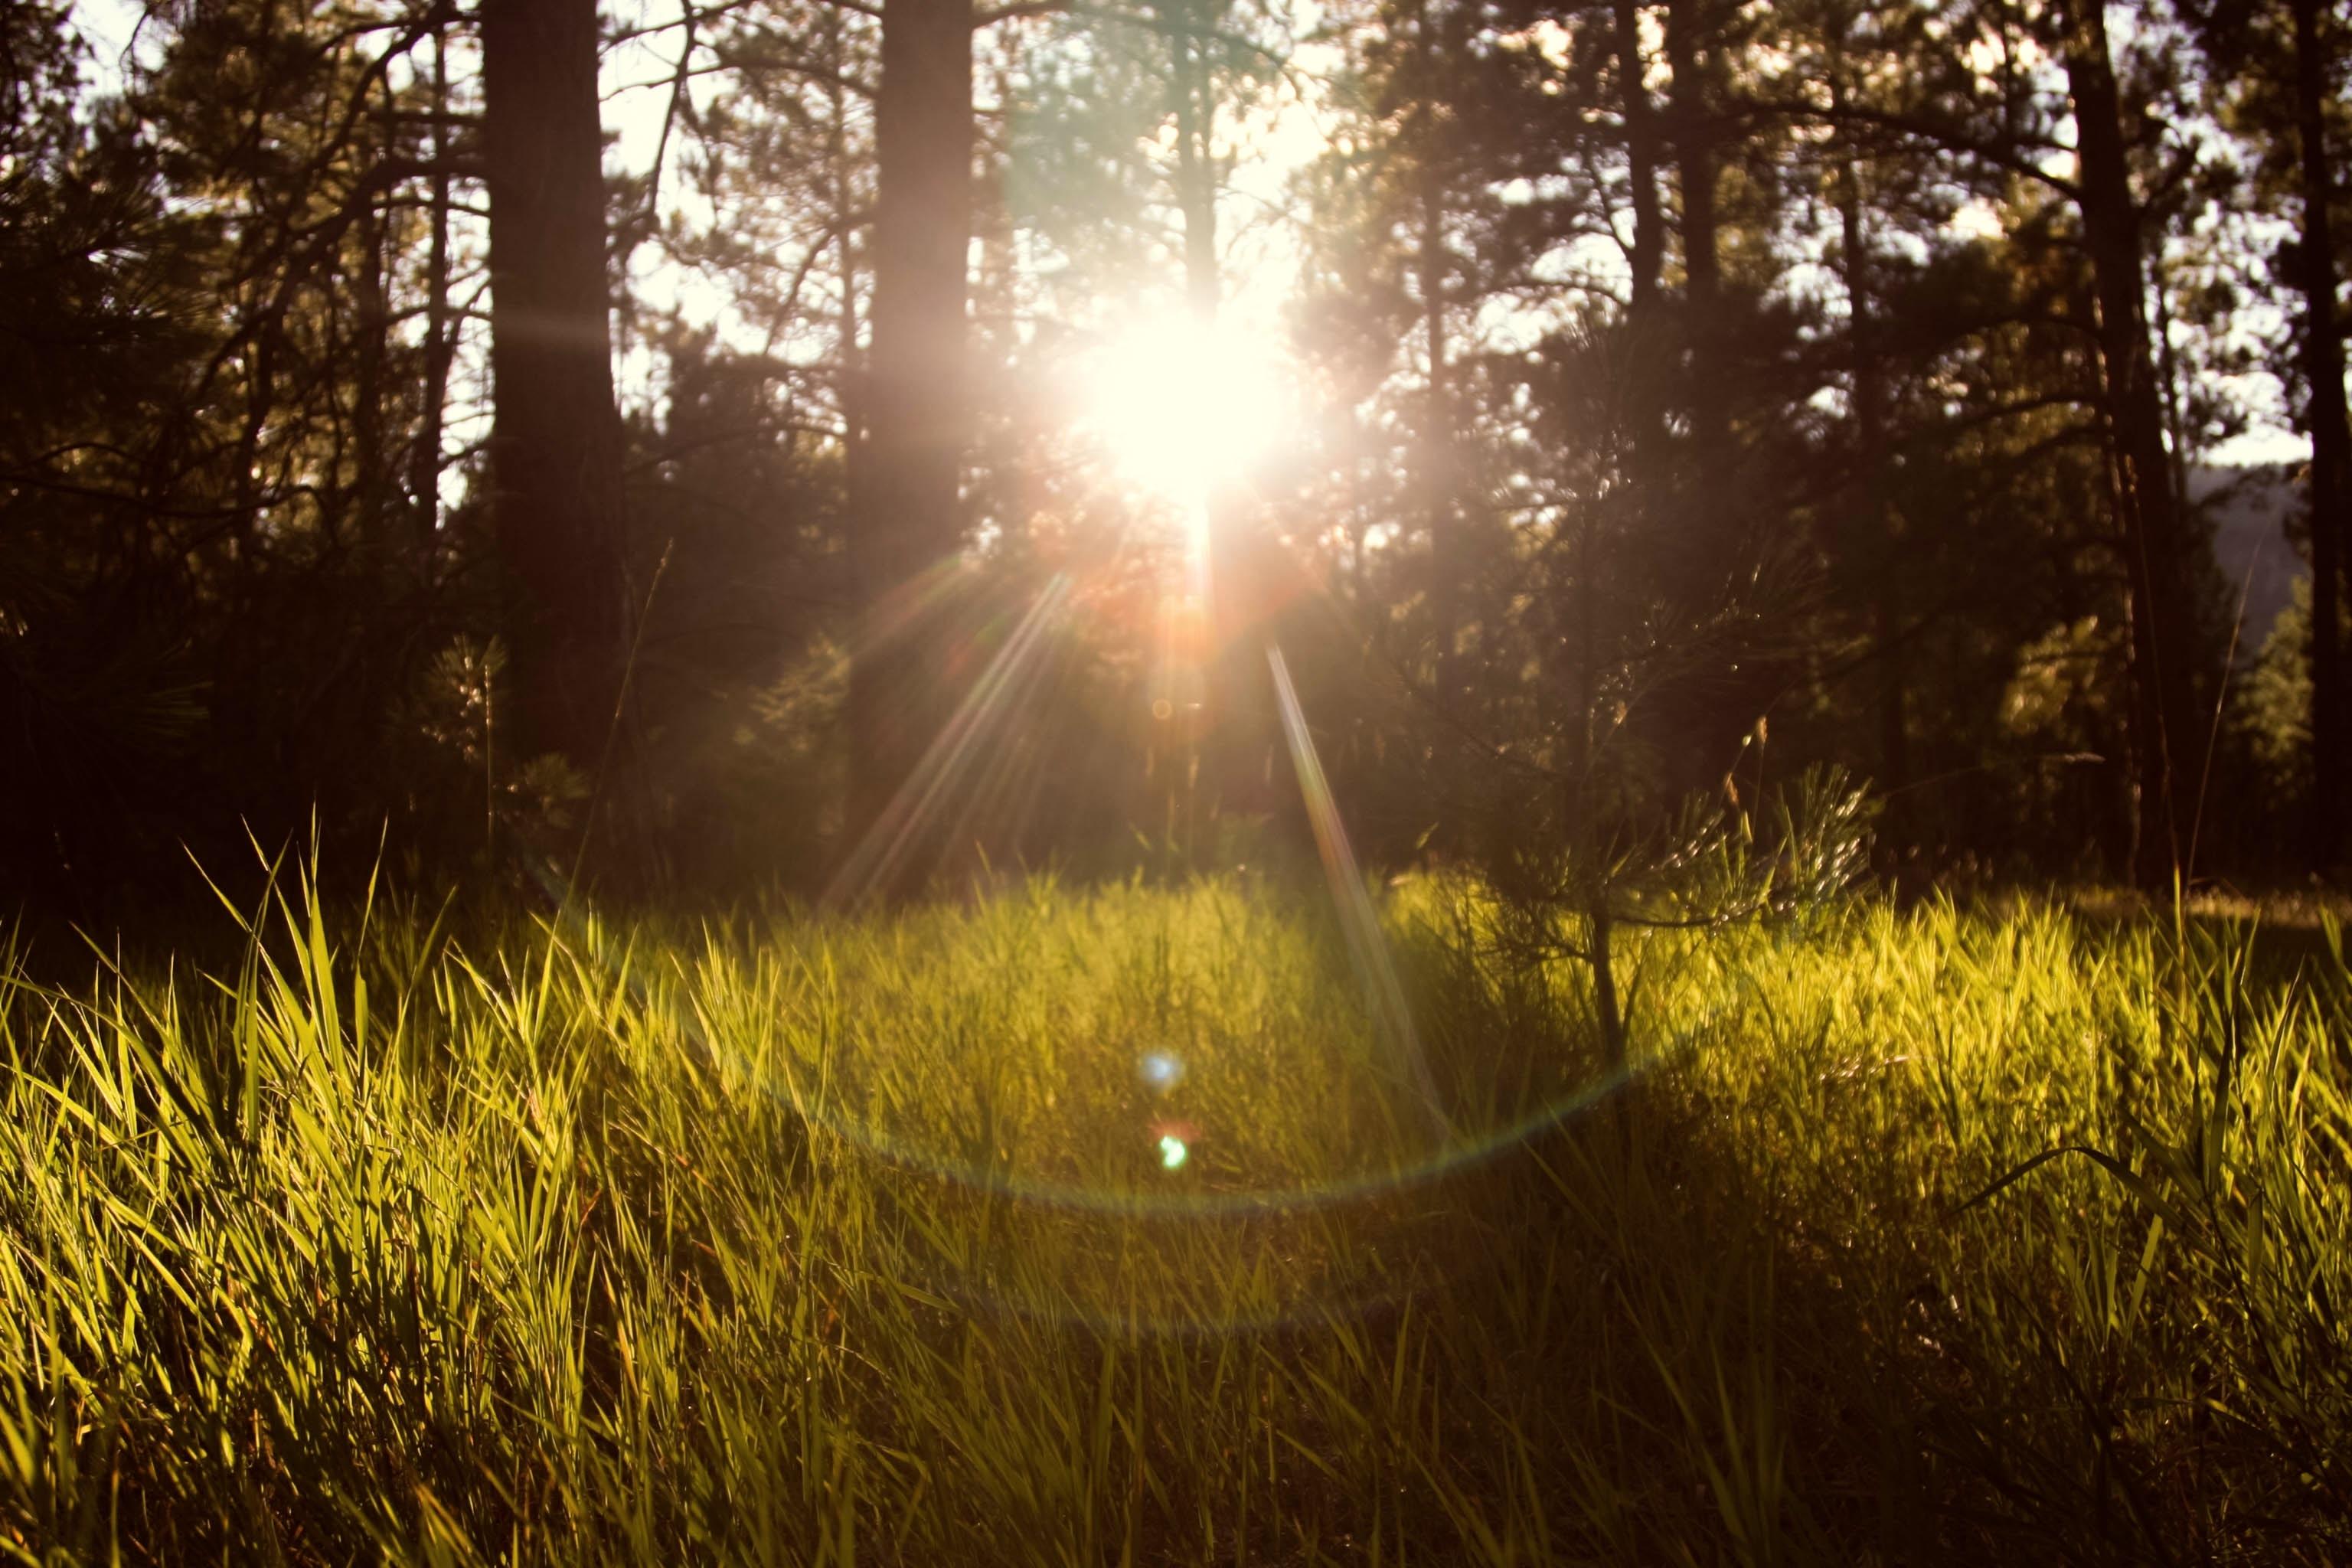 sunlight through trees